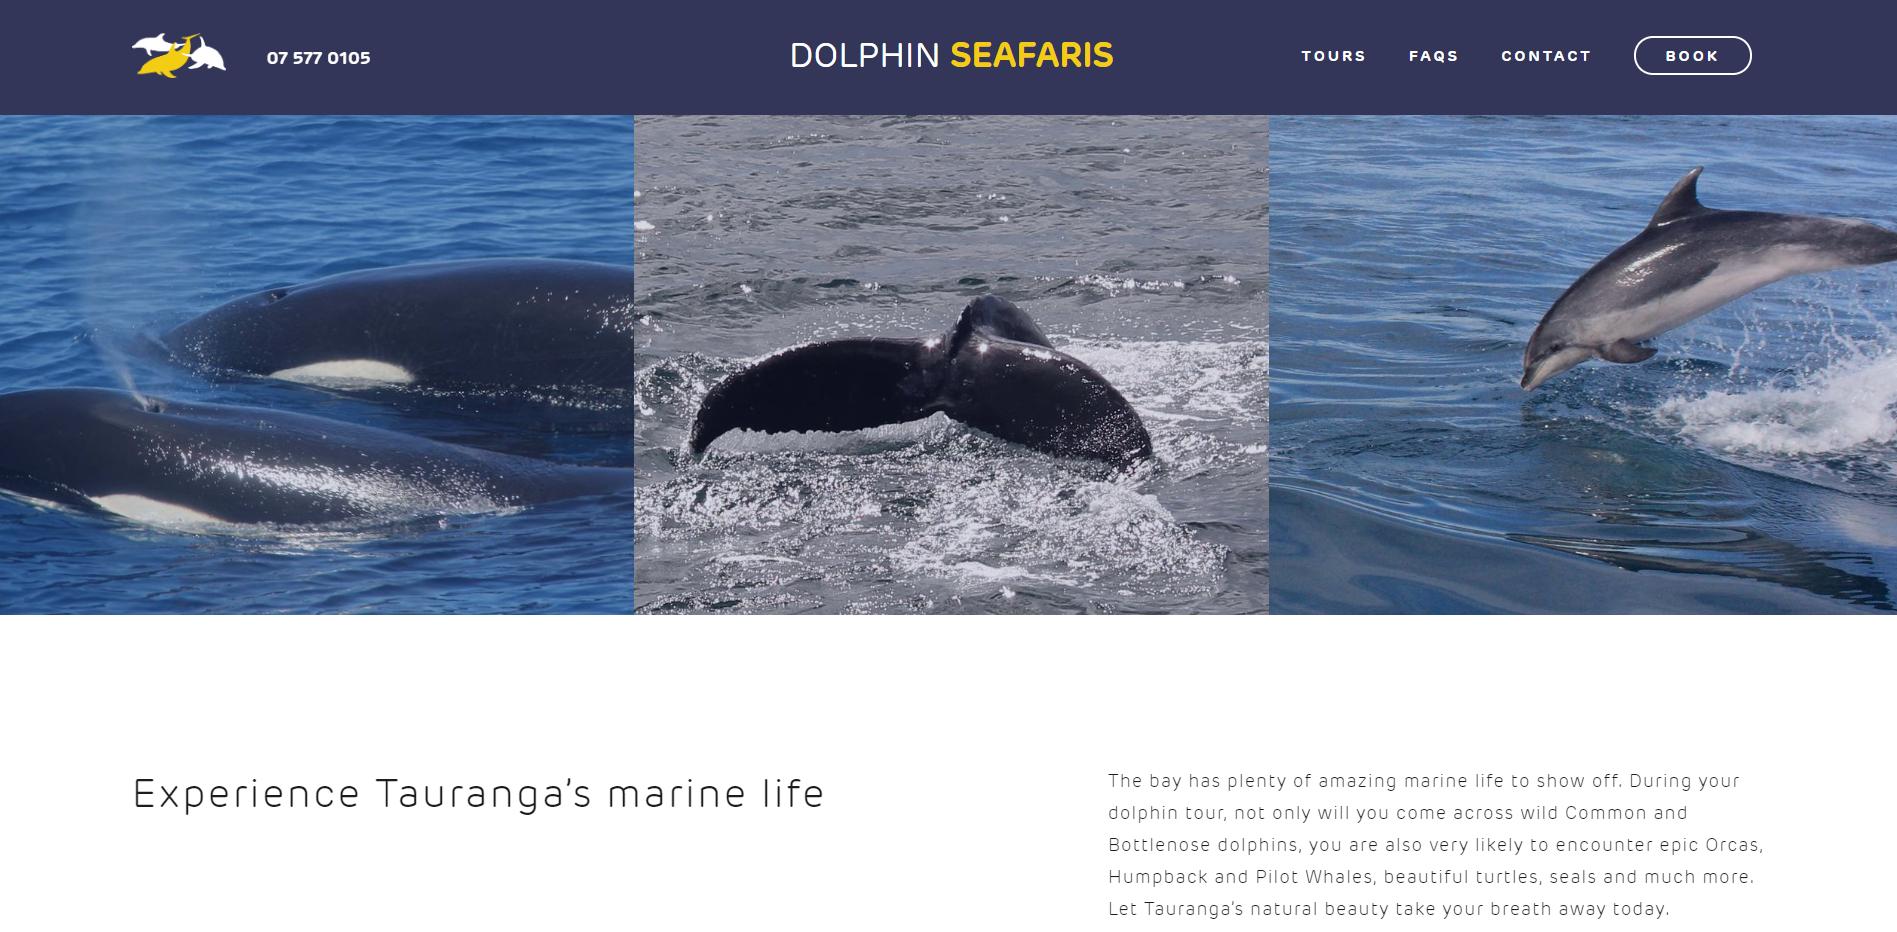 dolphin seafaris website developement.PNG